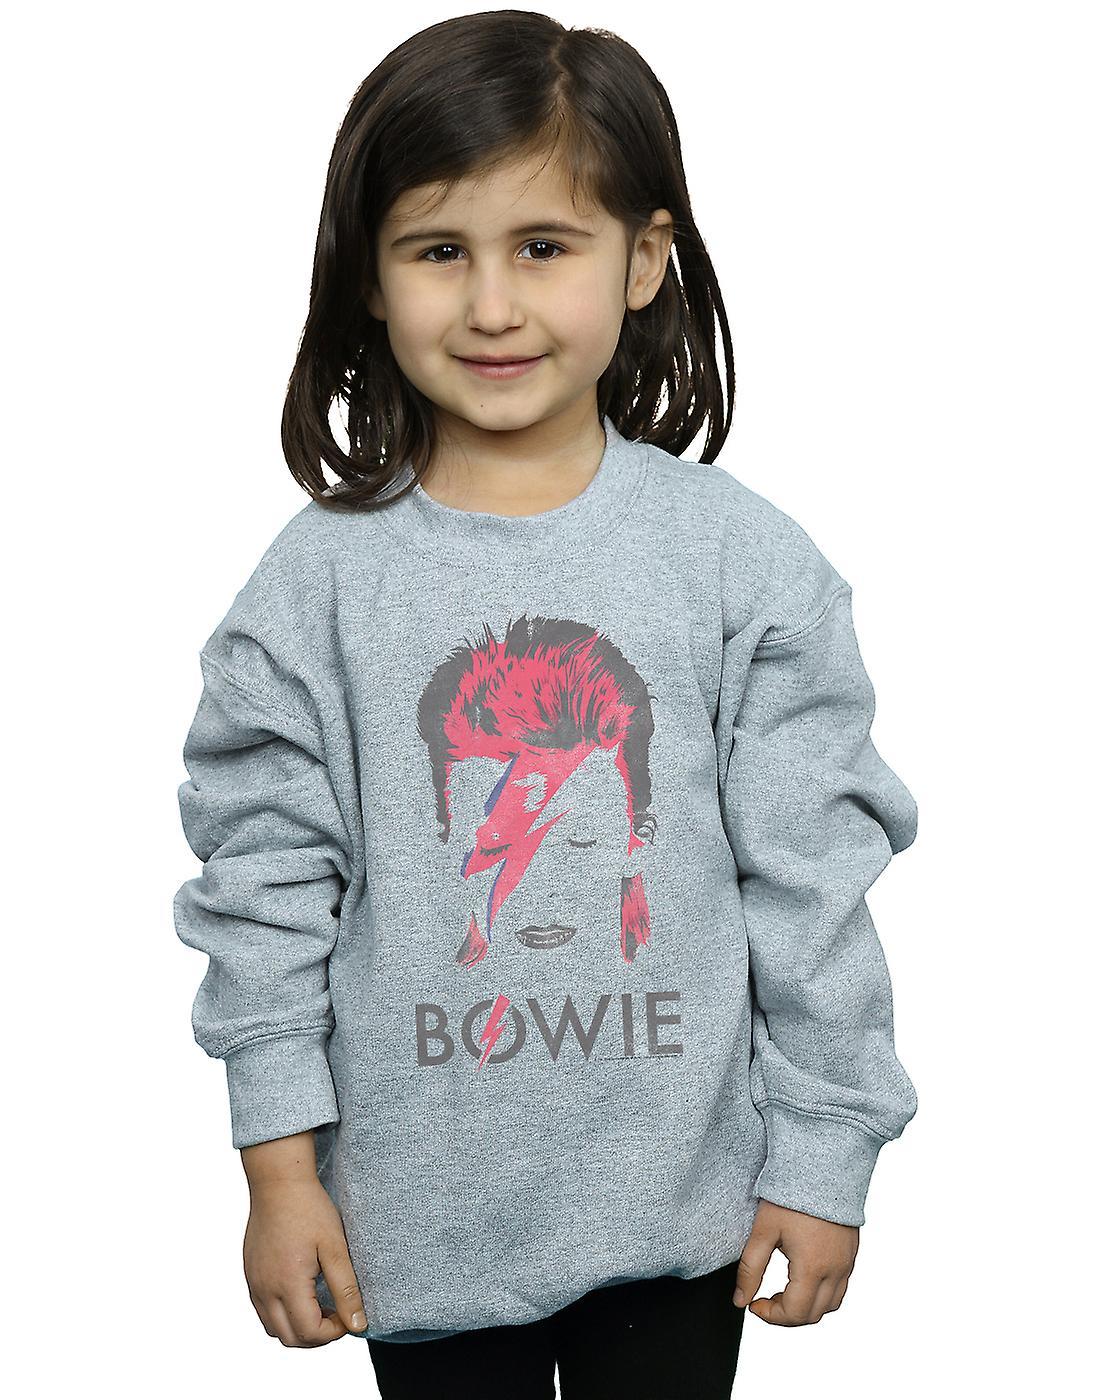 David Bowie Girls Aladdin Sane Distressed Sweatshirt